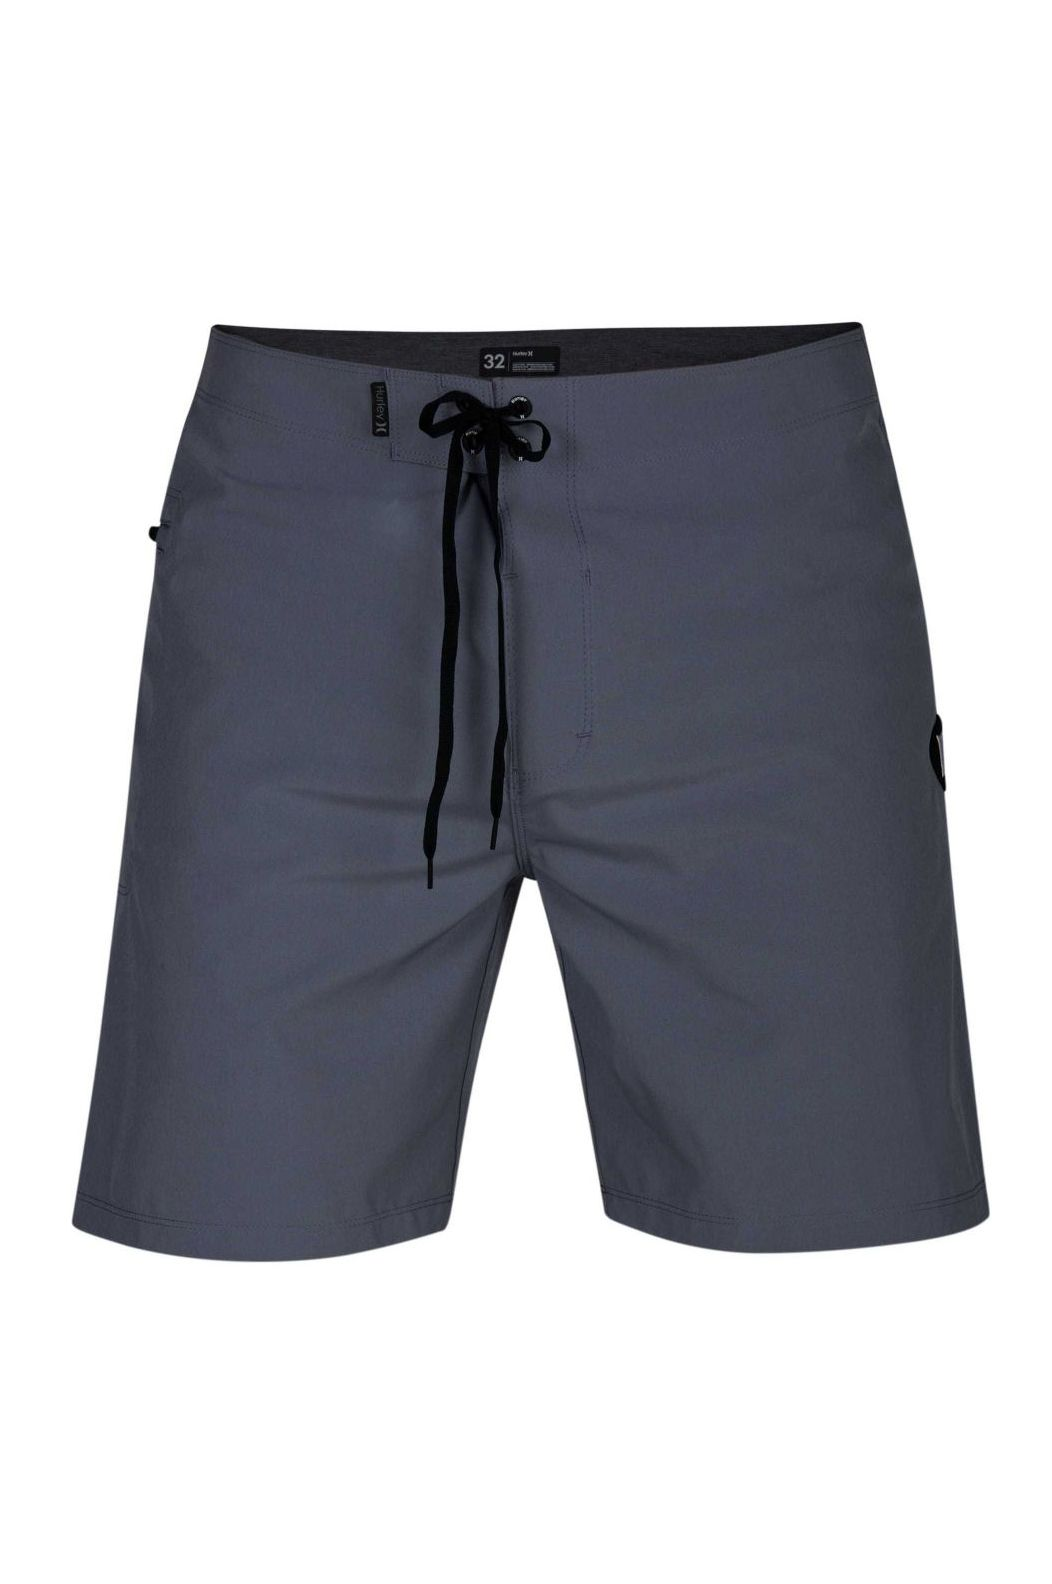 Boardshorts Hurley M PHANTOM ONE & ONLY 18' Cool Grey